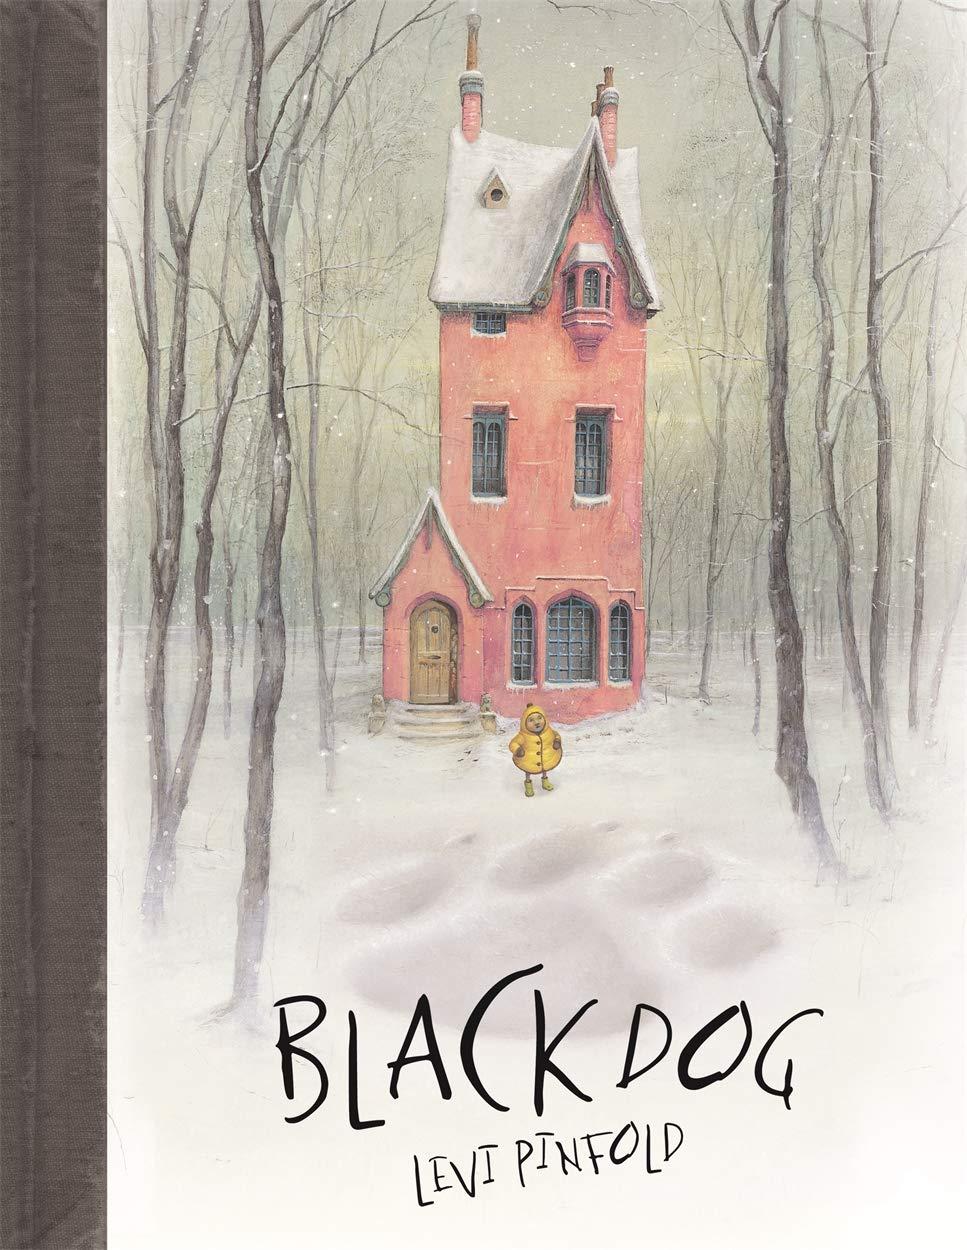 Black Dog: Amazon.co.uk: Levi Pinfold, Levi Pinfold: Books